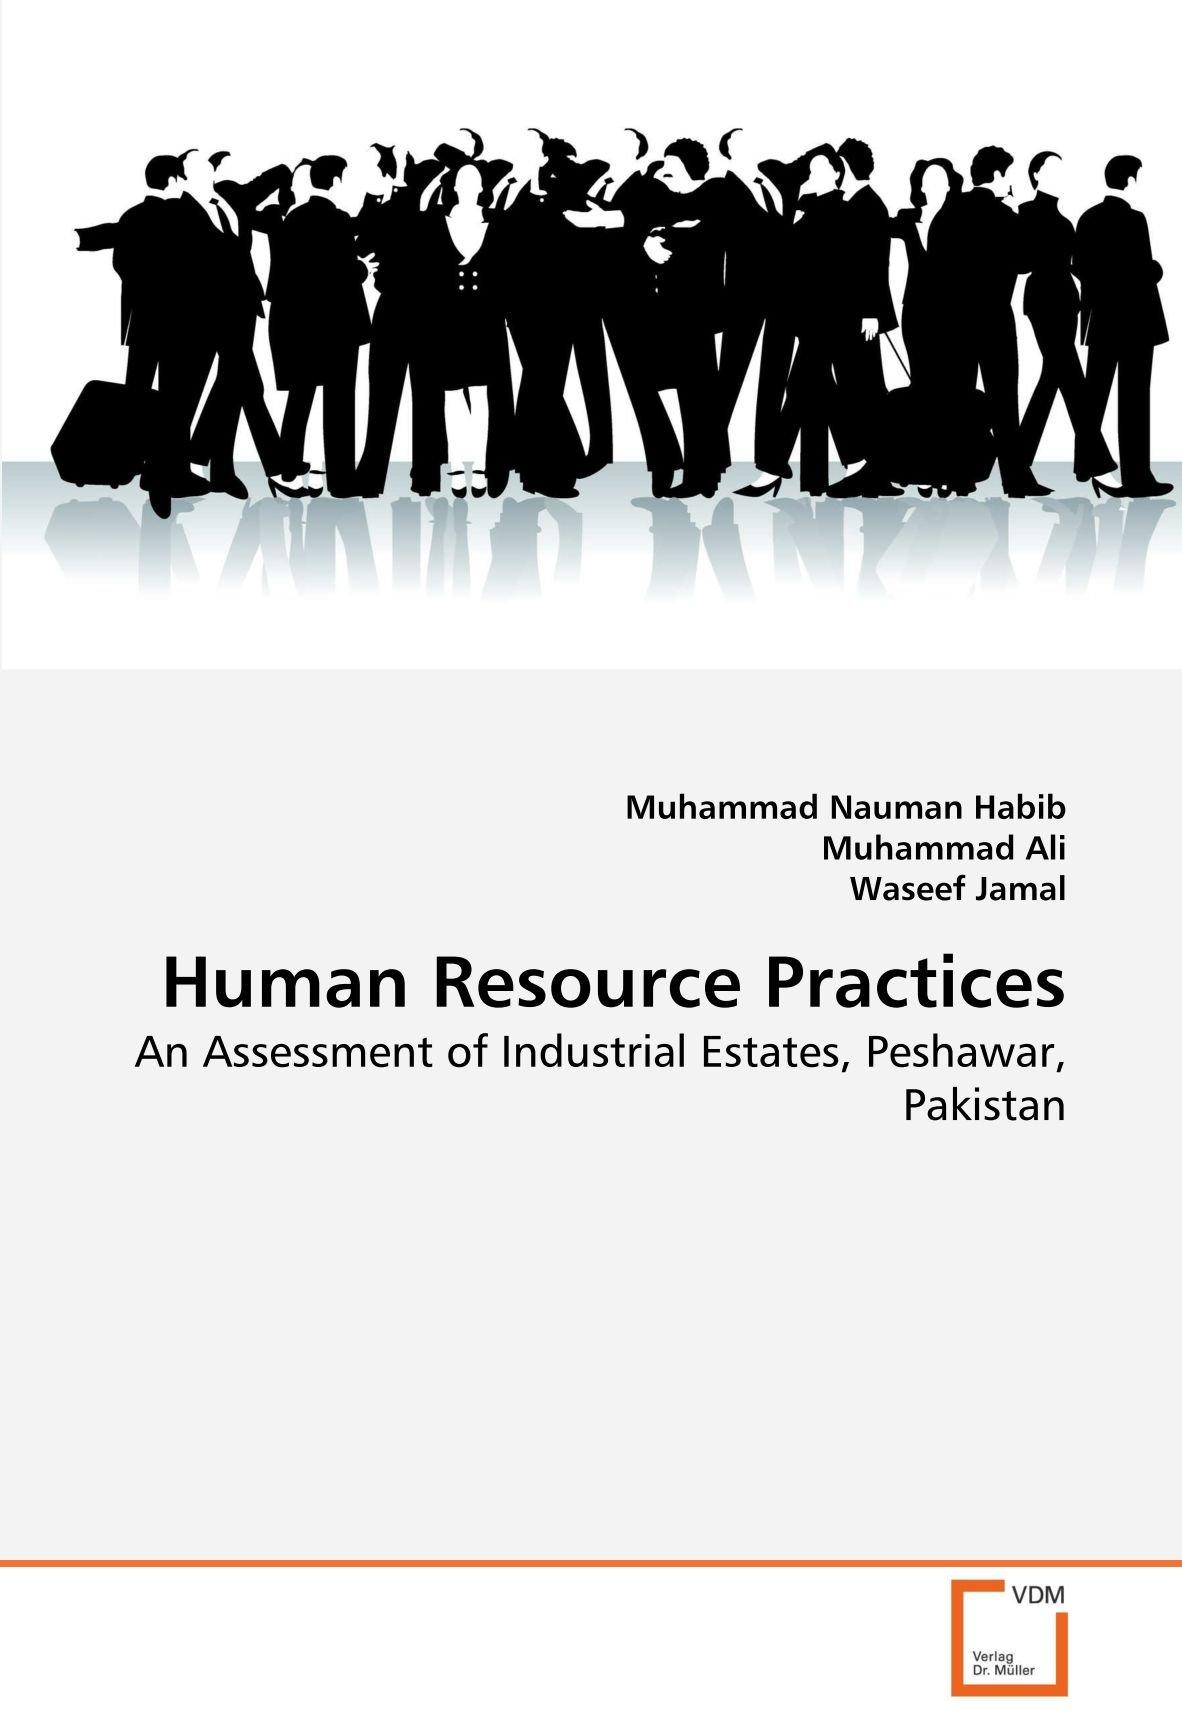 Human Resource Practices: An Assessment of Industrial Estates, Peshawar, Pakistan pdf